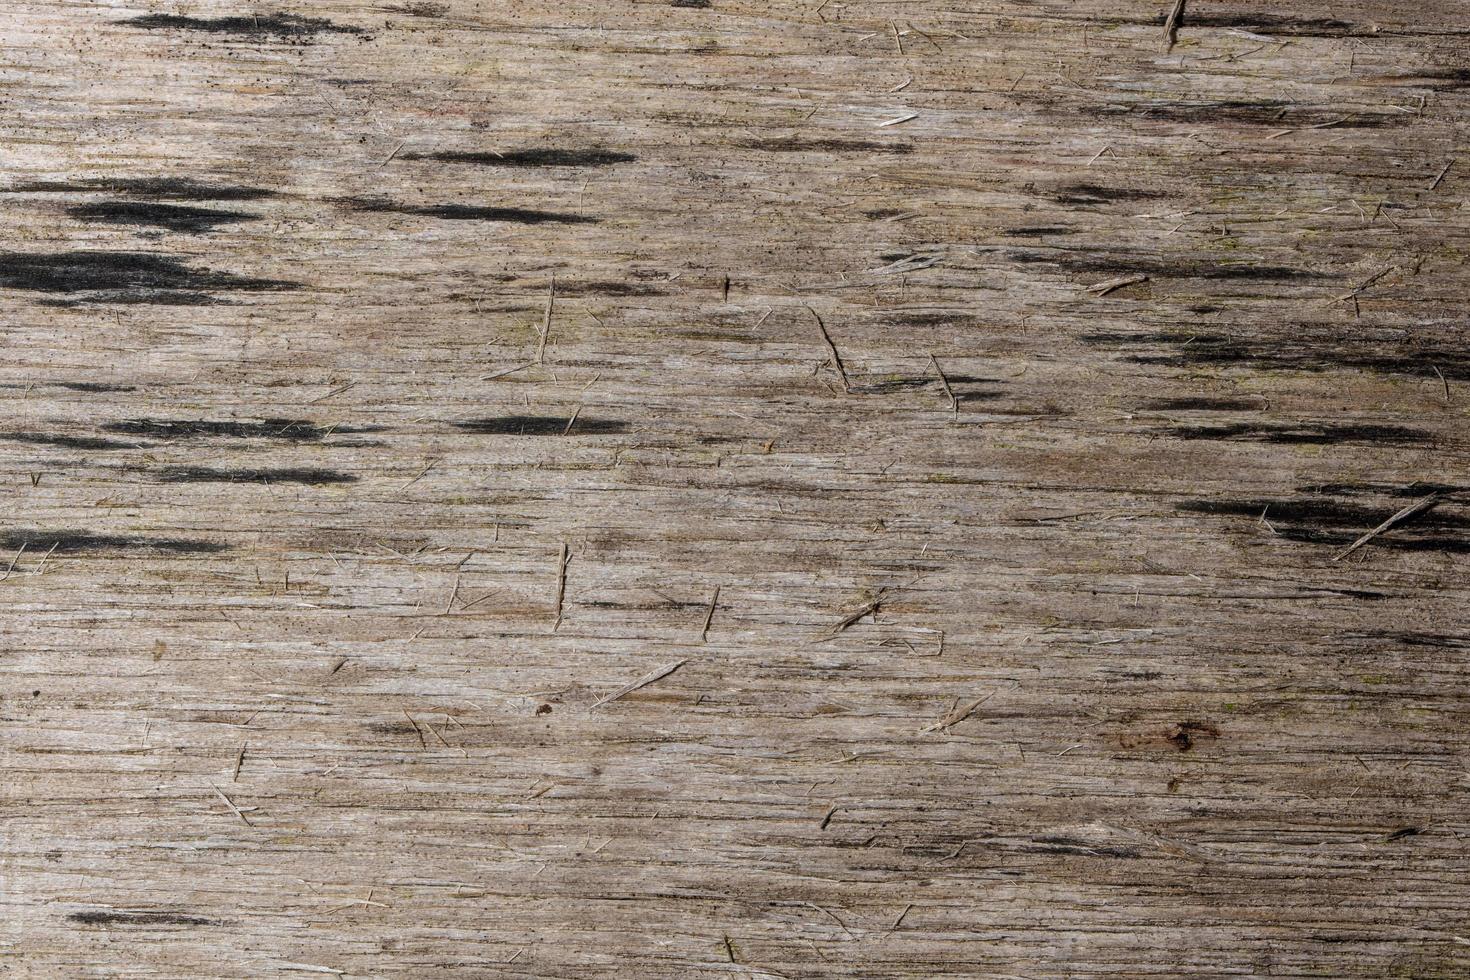 fondo madera textura foto